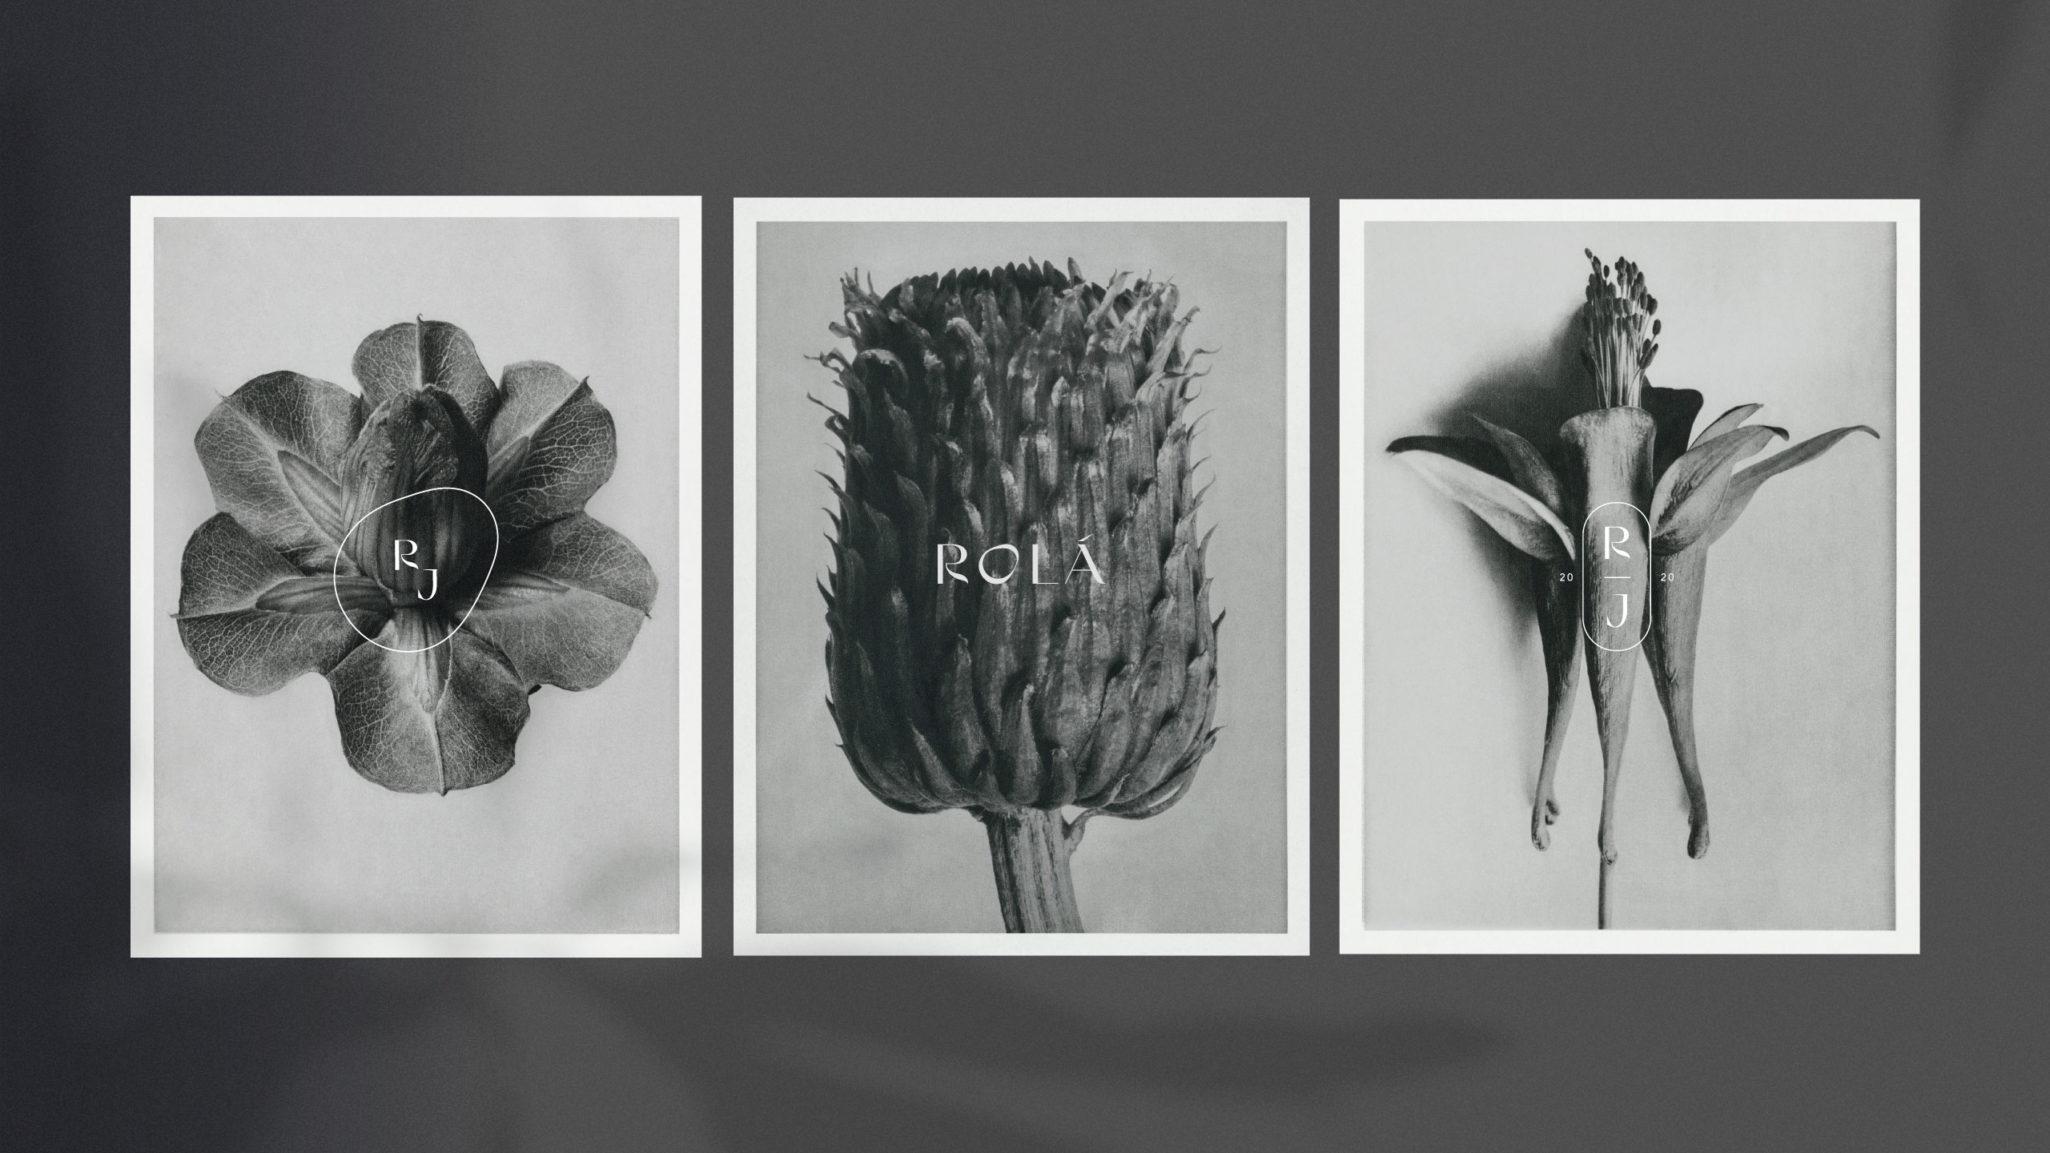 Rolá — Branding